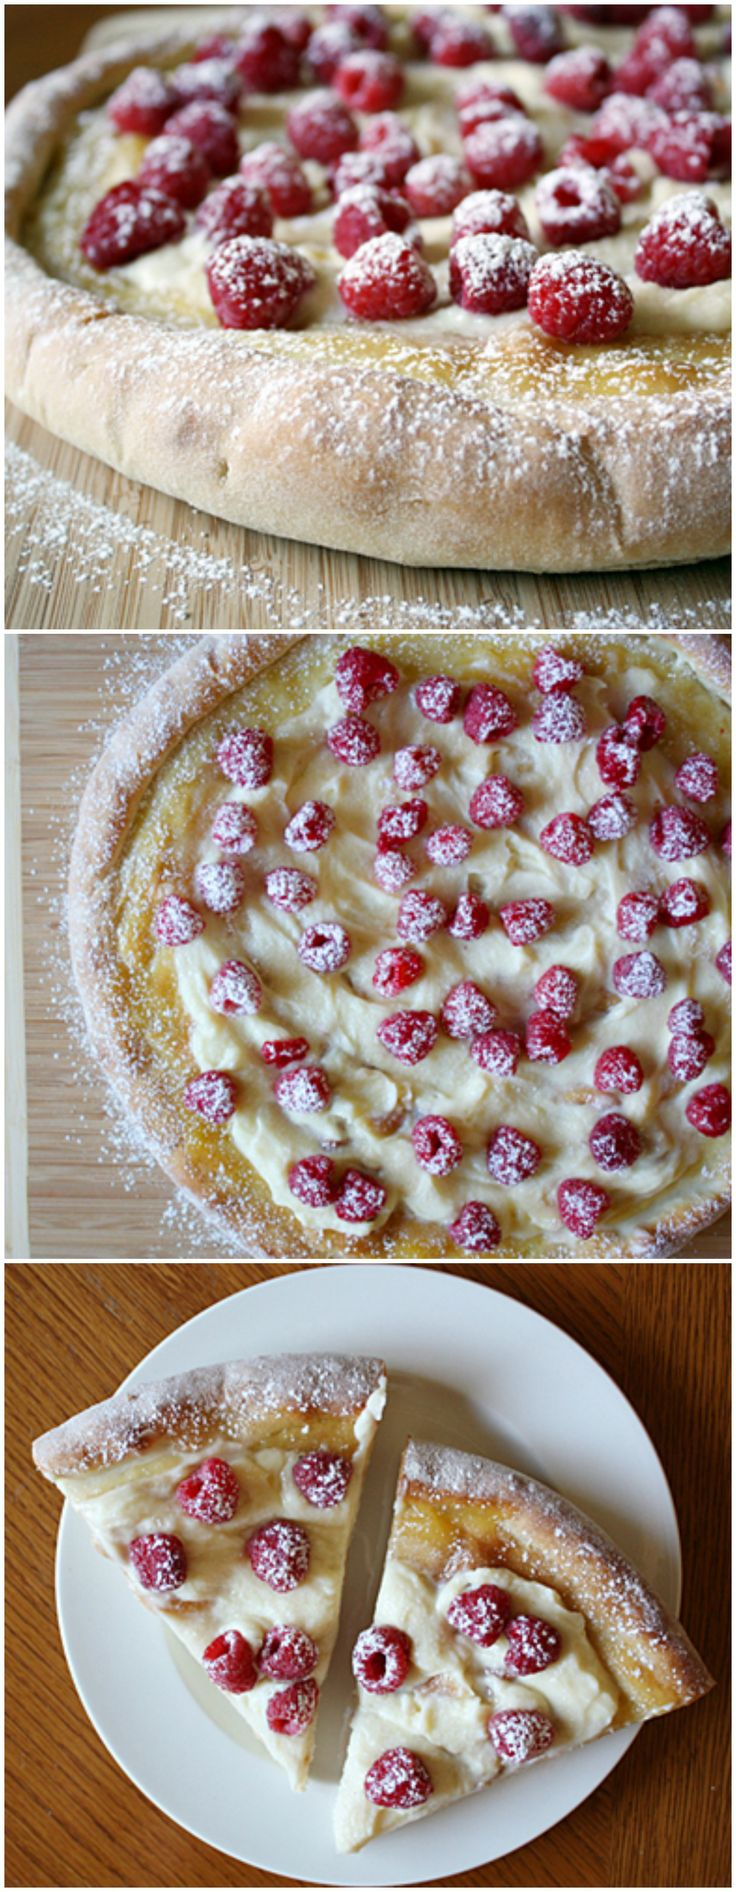 Raspberry Mascarpone Pizza